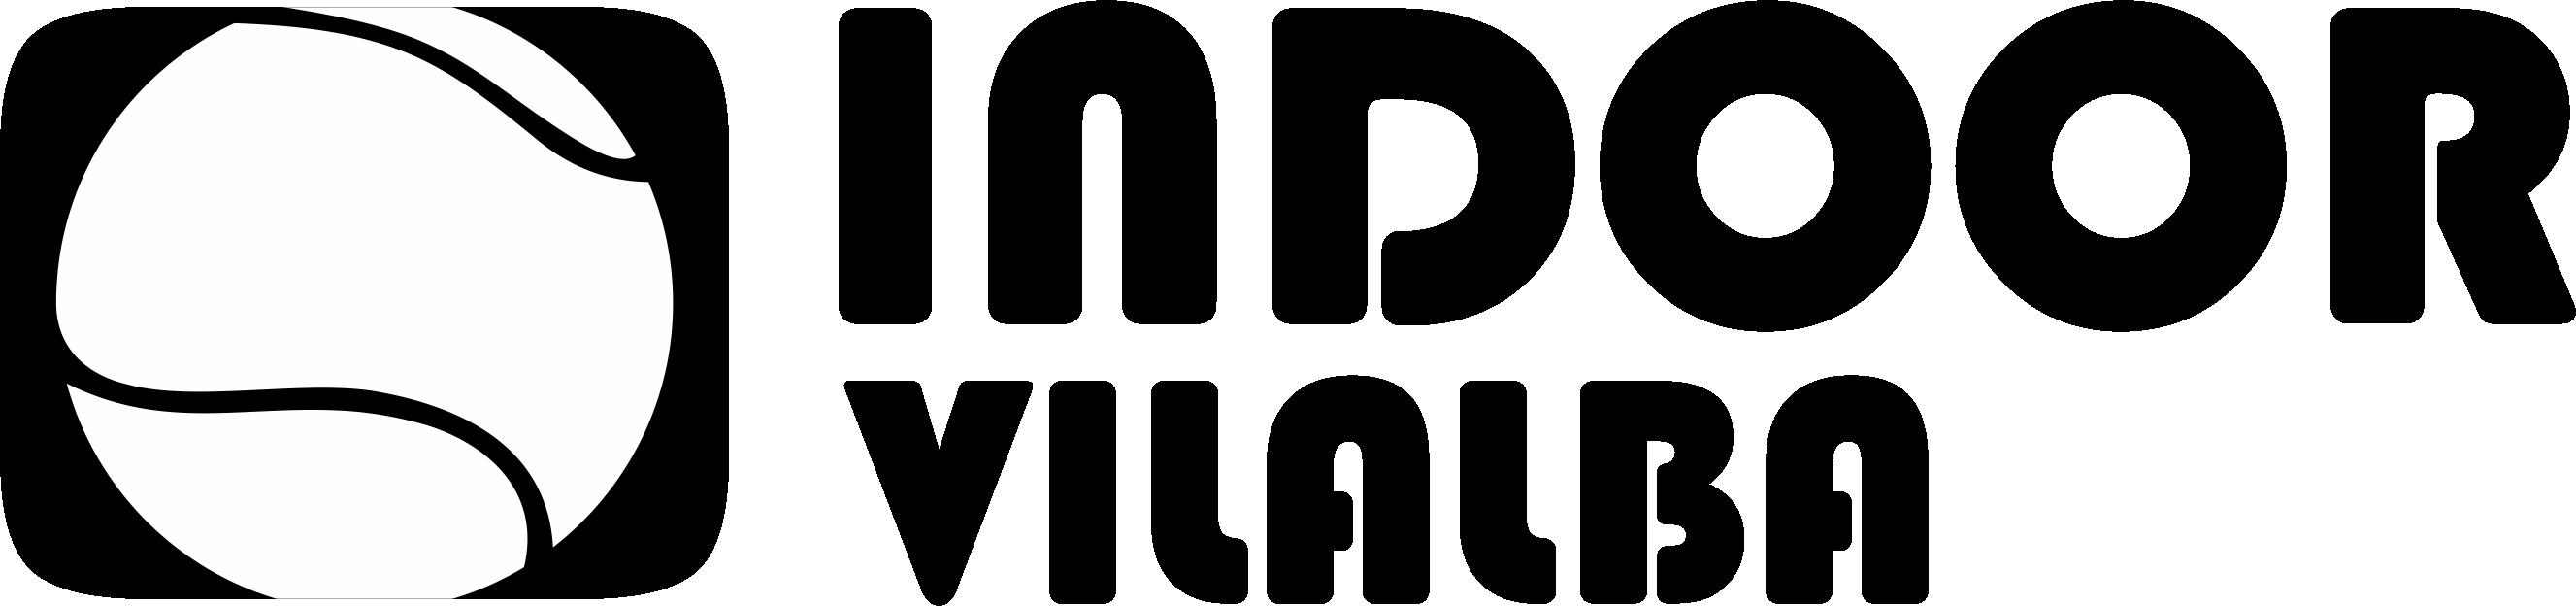 Logo 2a0e6ca4c660502cfa0c3a288528b42bdf7bdc8c77b0a3074f480d8f4a36567b